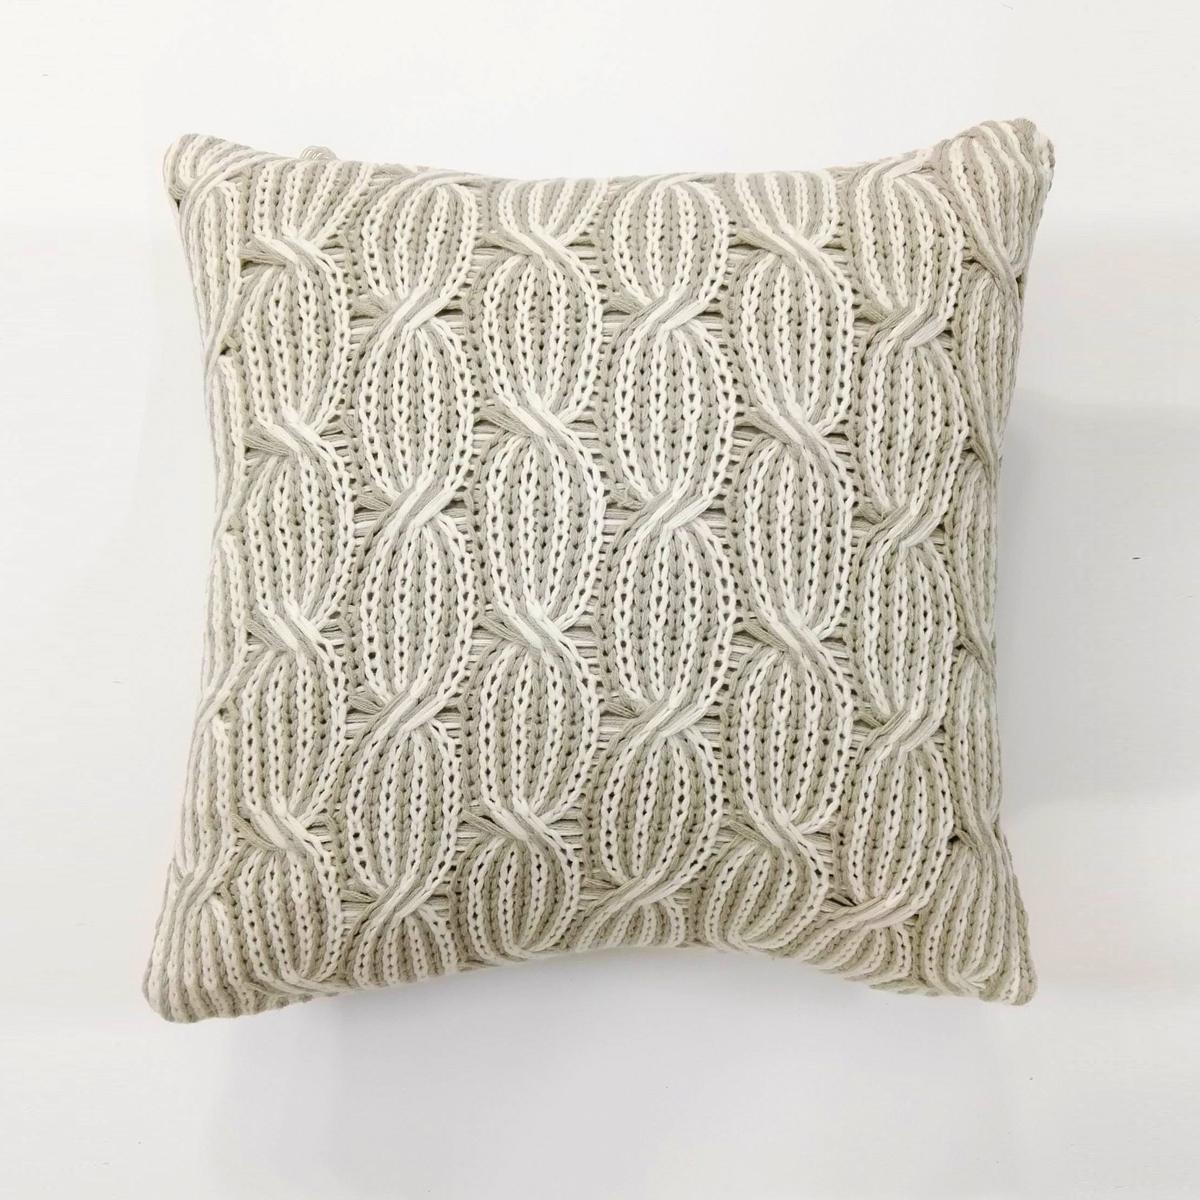 Купить Декоративные подушки Arya, Декоративная наволочка Sia (45х45), Турция, Вязаный акрил